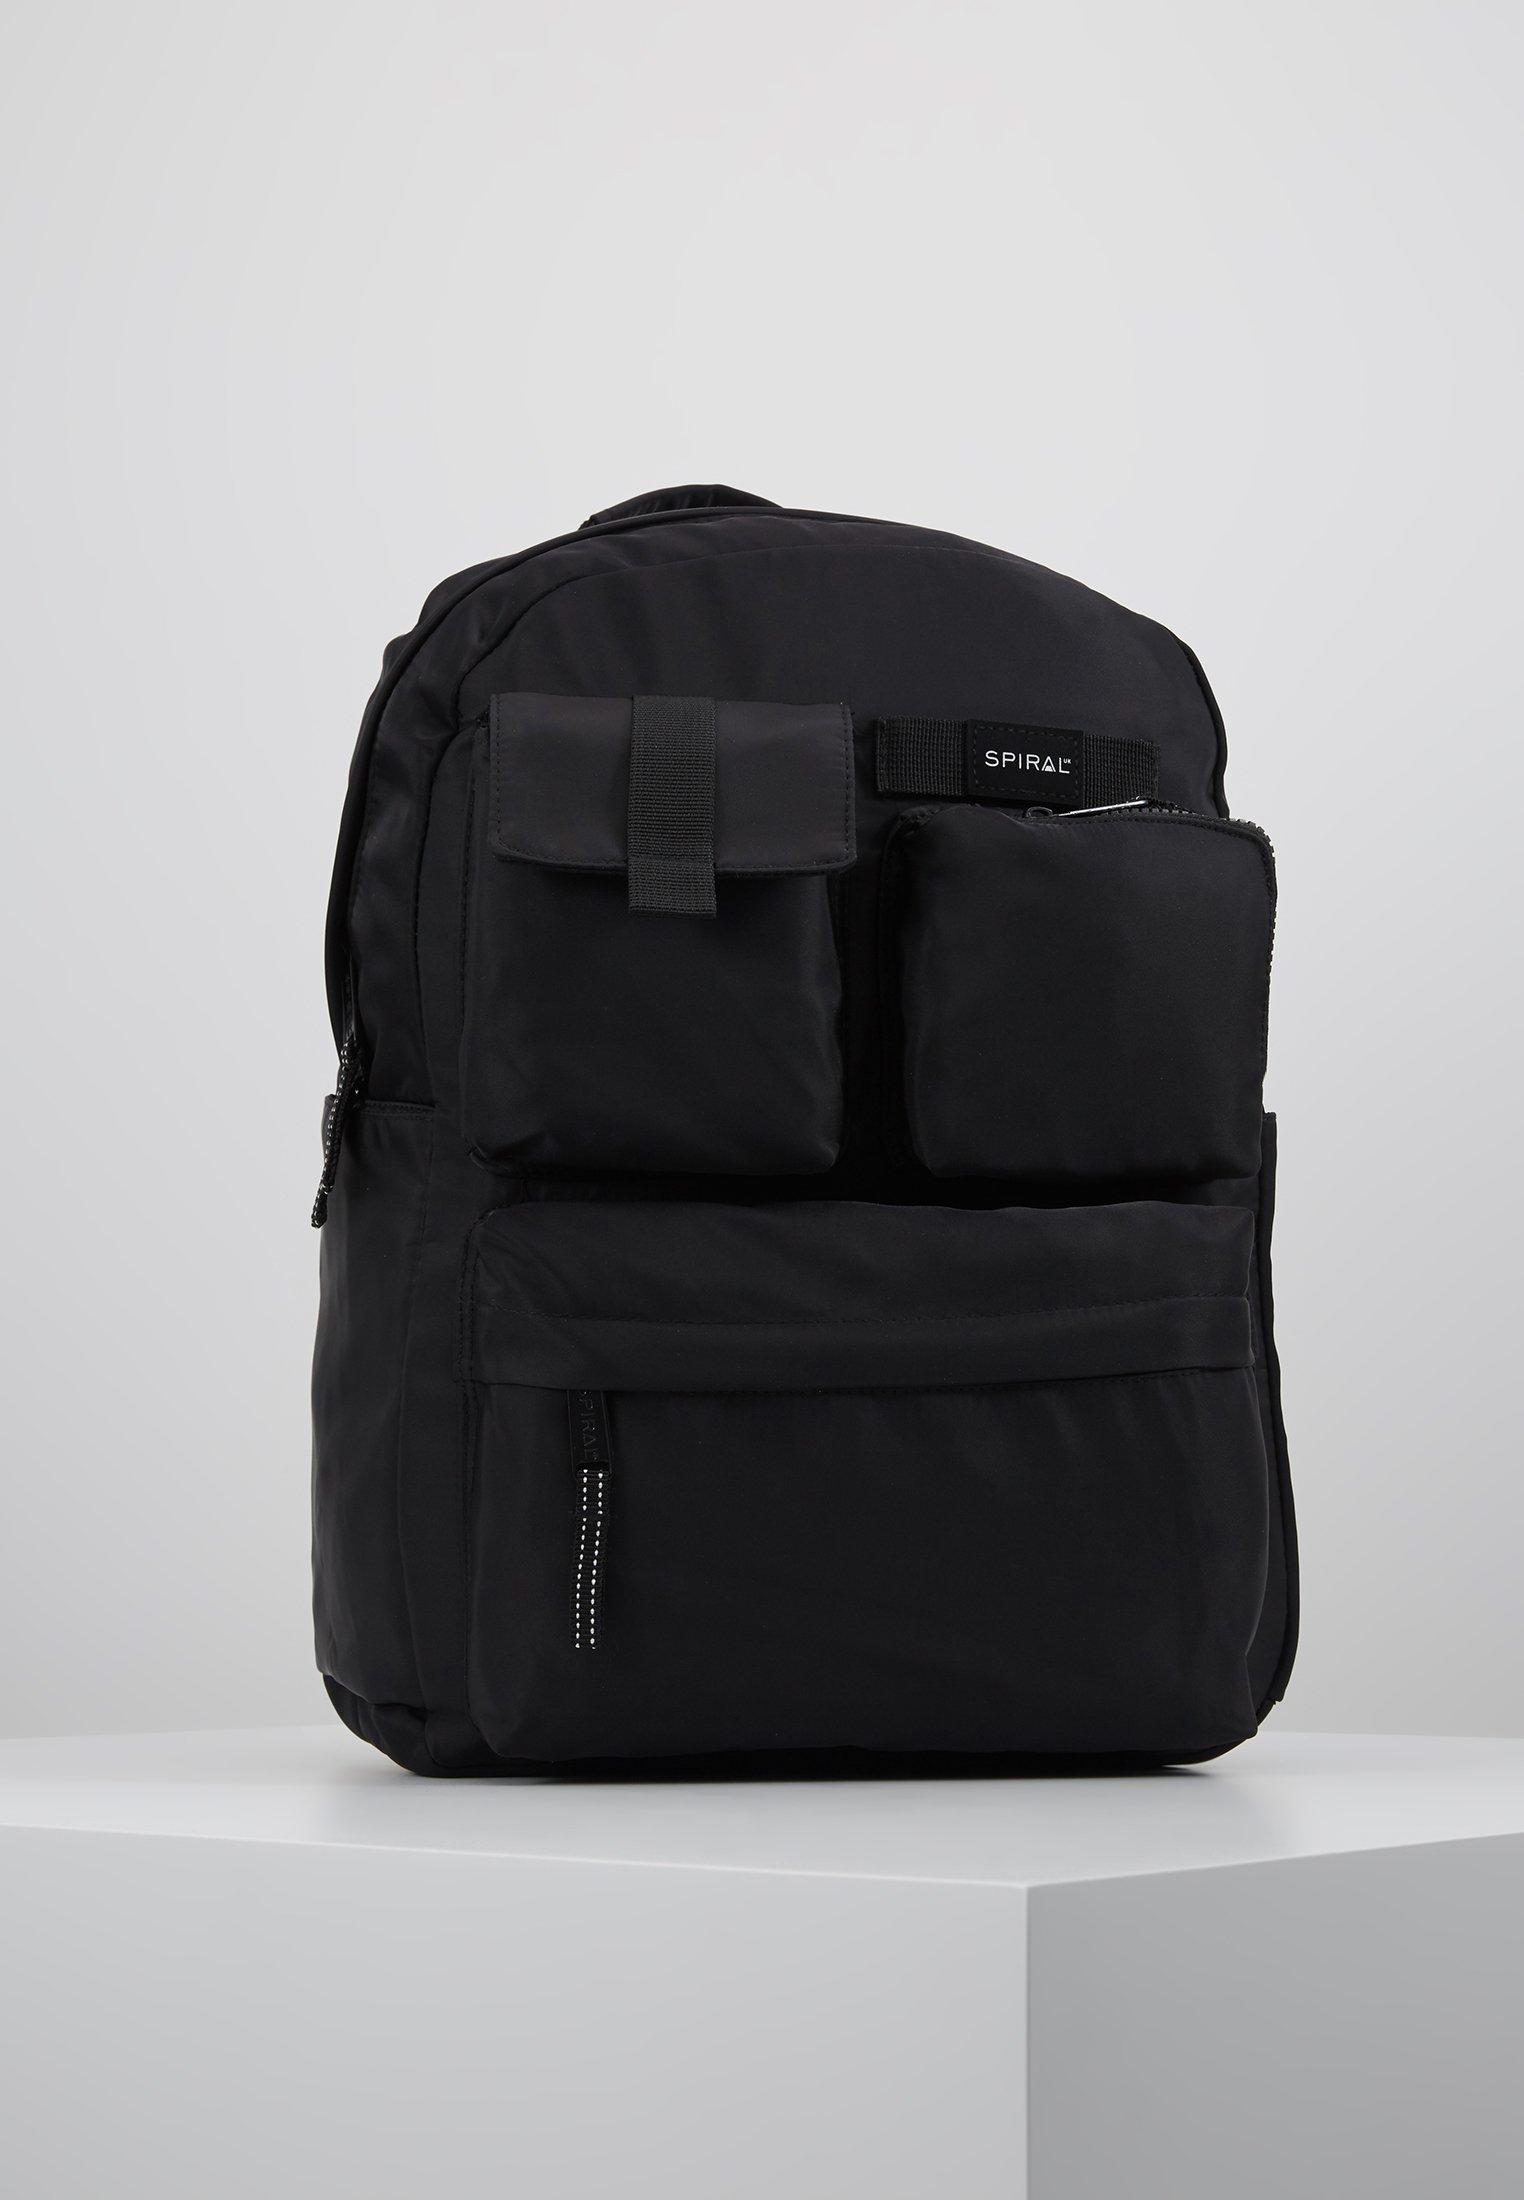 Bags Spiral Spiral Bags SummitZaino Black Black SummitZaino vb6yYfg7